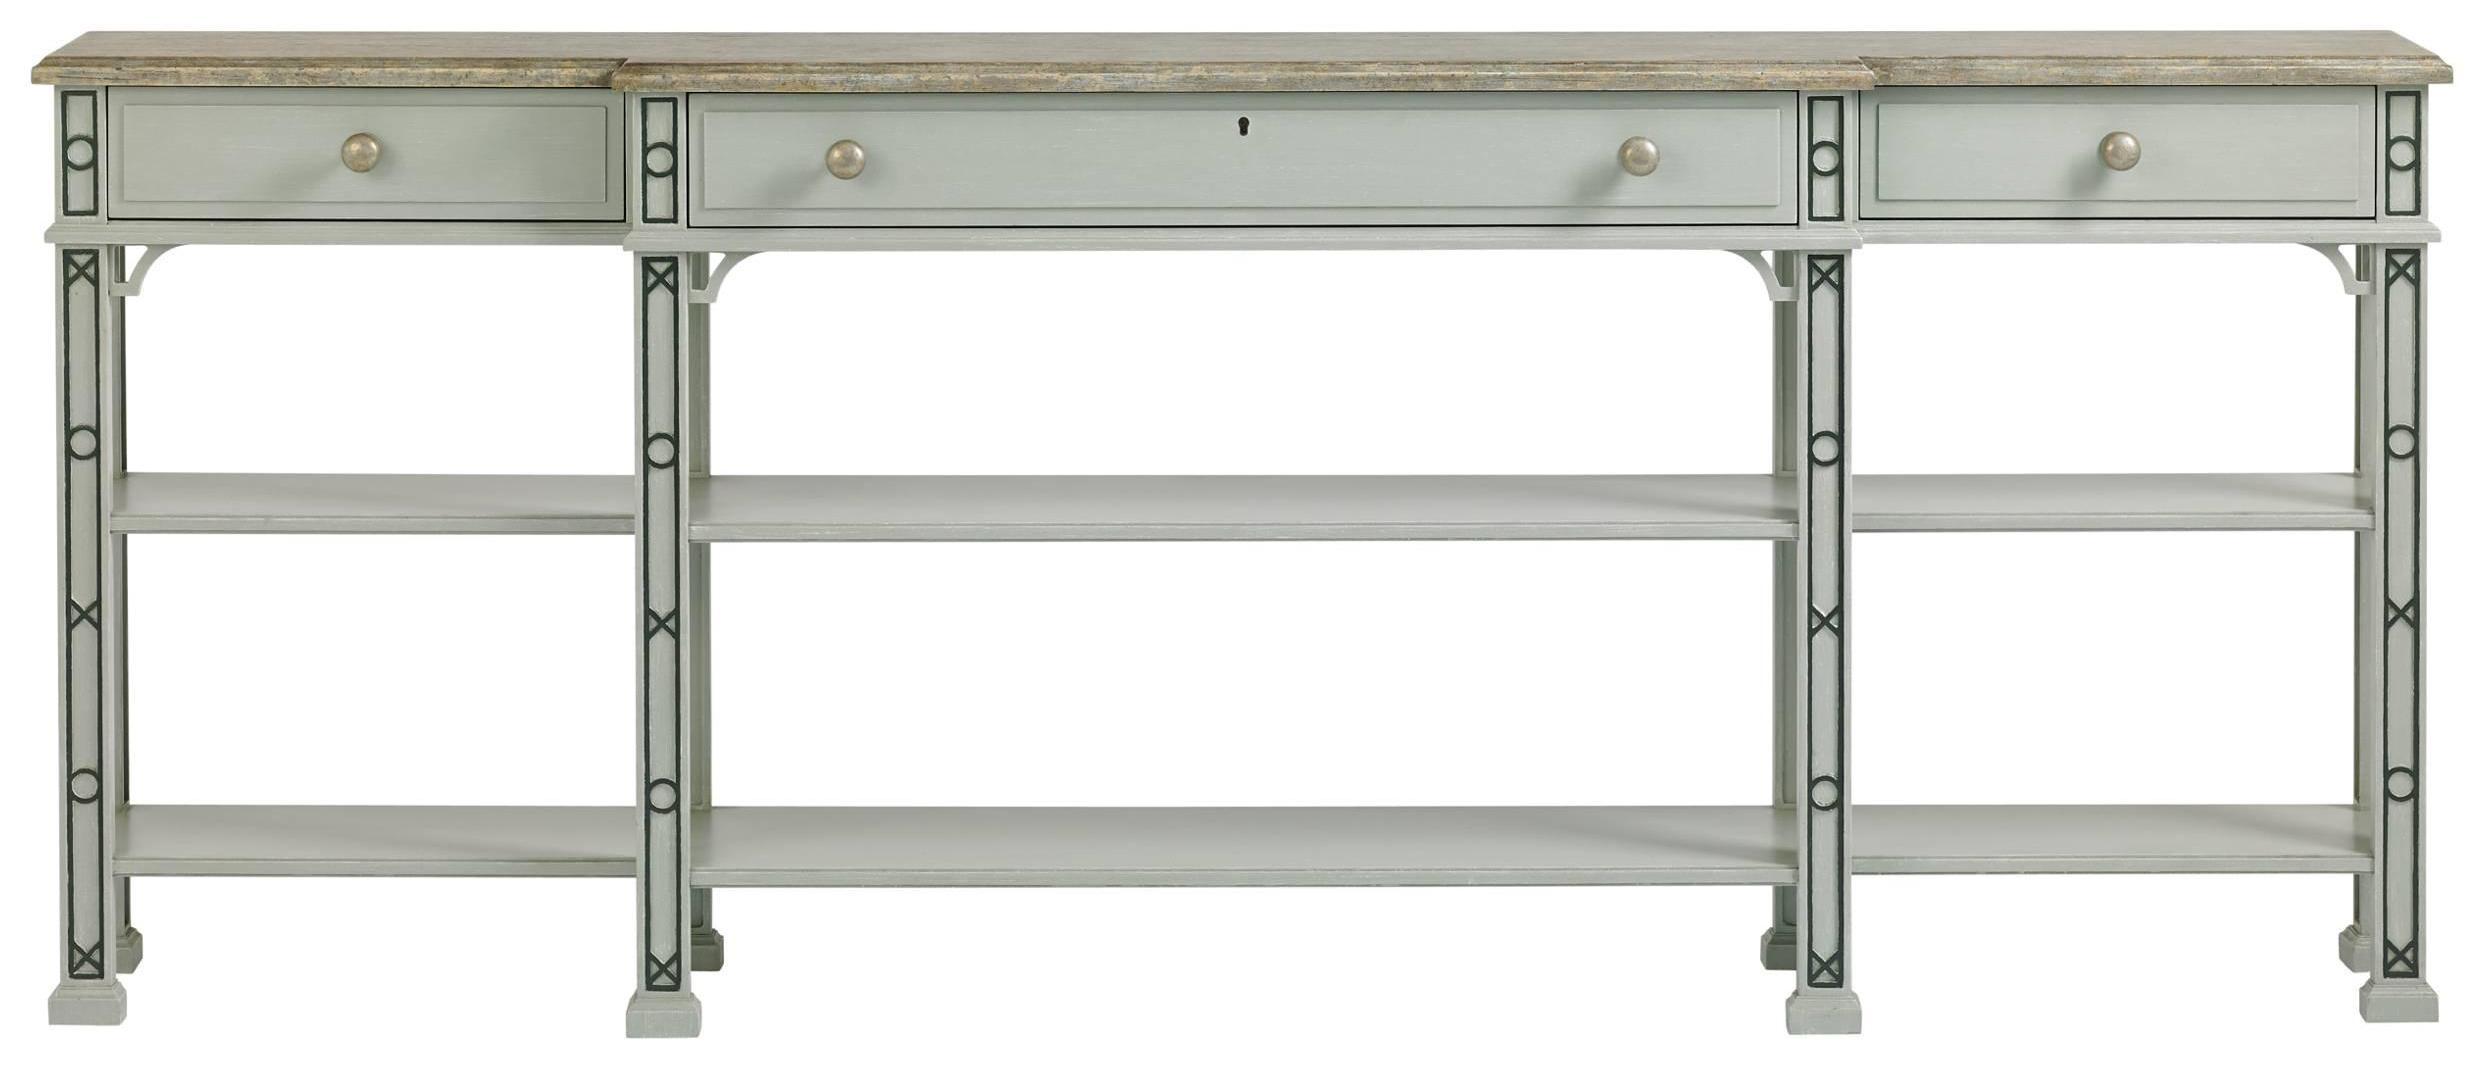 Stanley Furniture Preserve Brighton Sofa Table - Item Number: 340-55-05